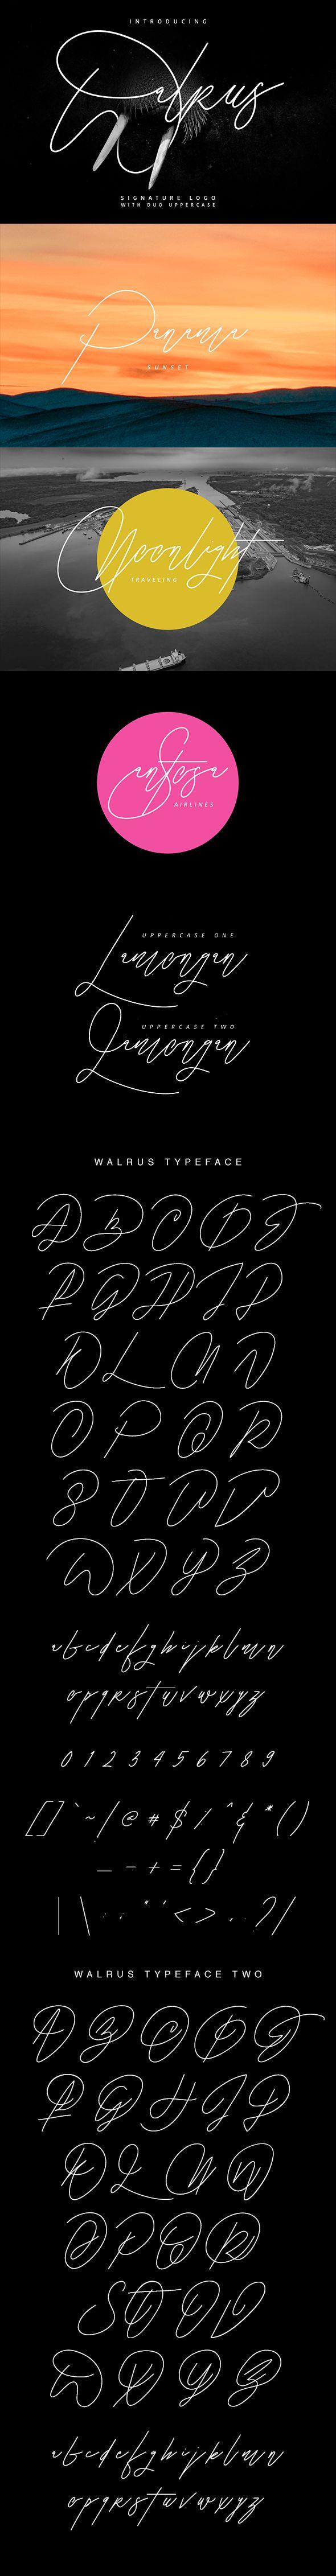 Walrus Signature Font — TrueType TTF #elegant #maulanacreative • Download ➝ https://graphicriver.net/item/walrus-signature-font/19613420?ref=pxcr